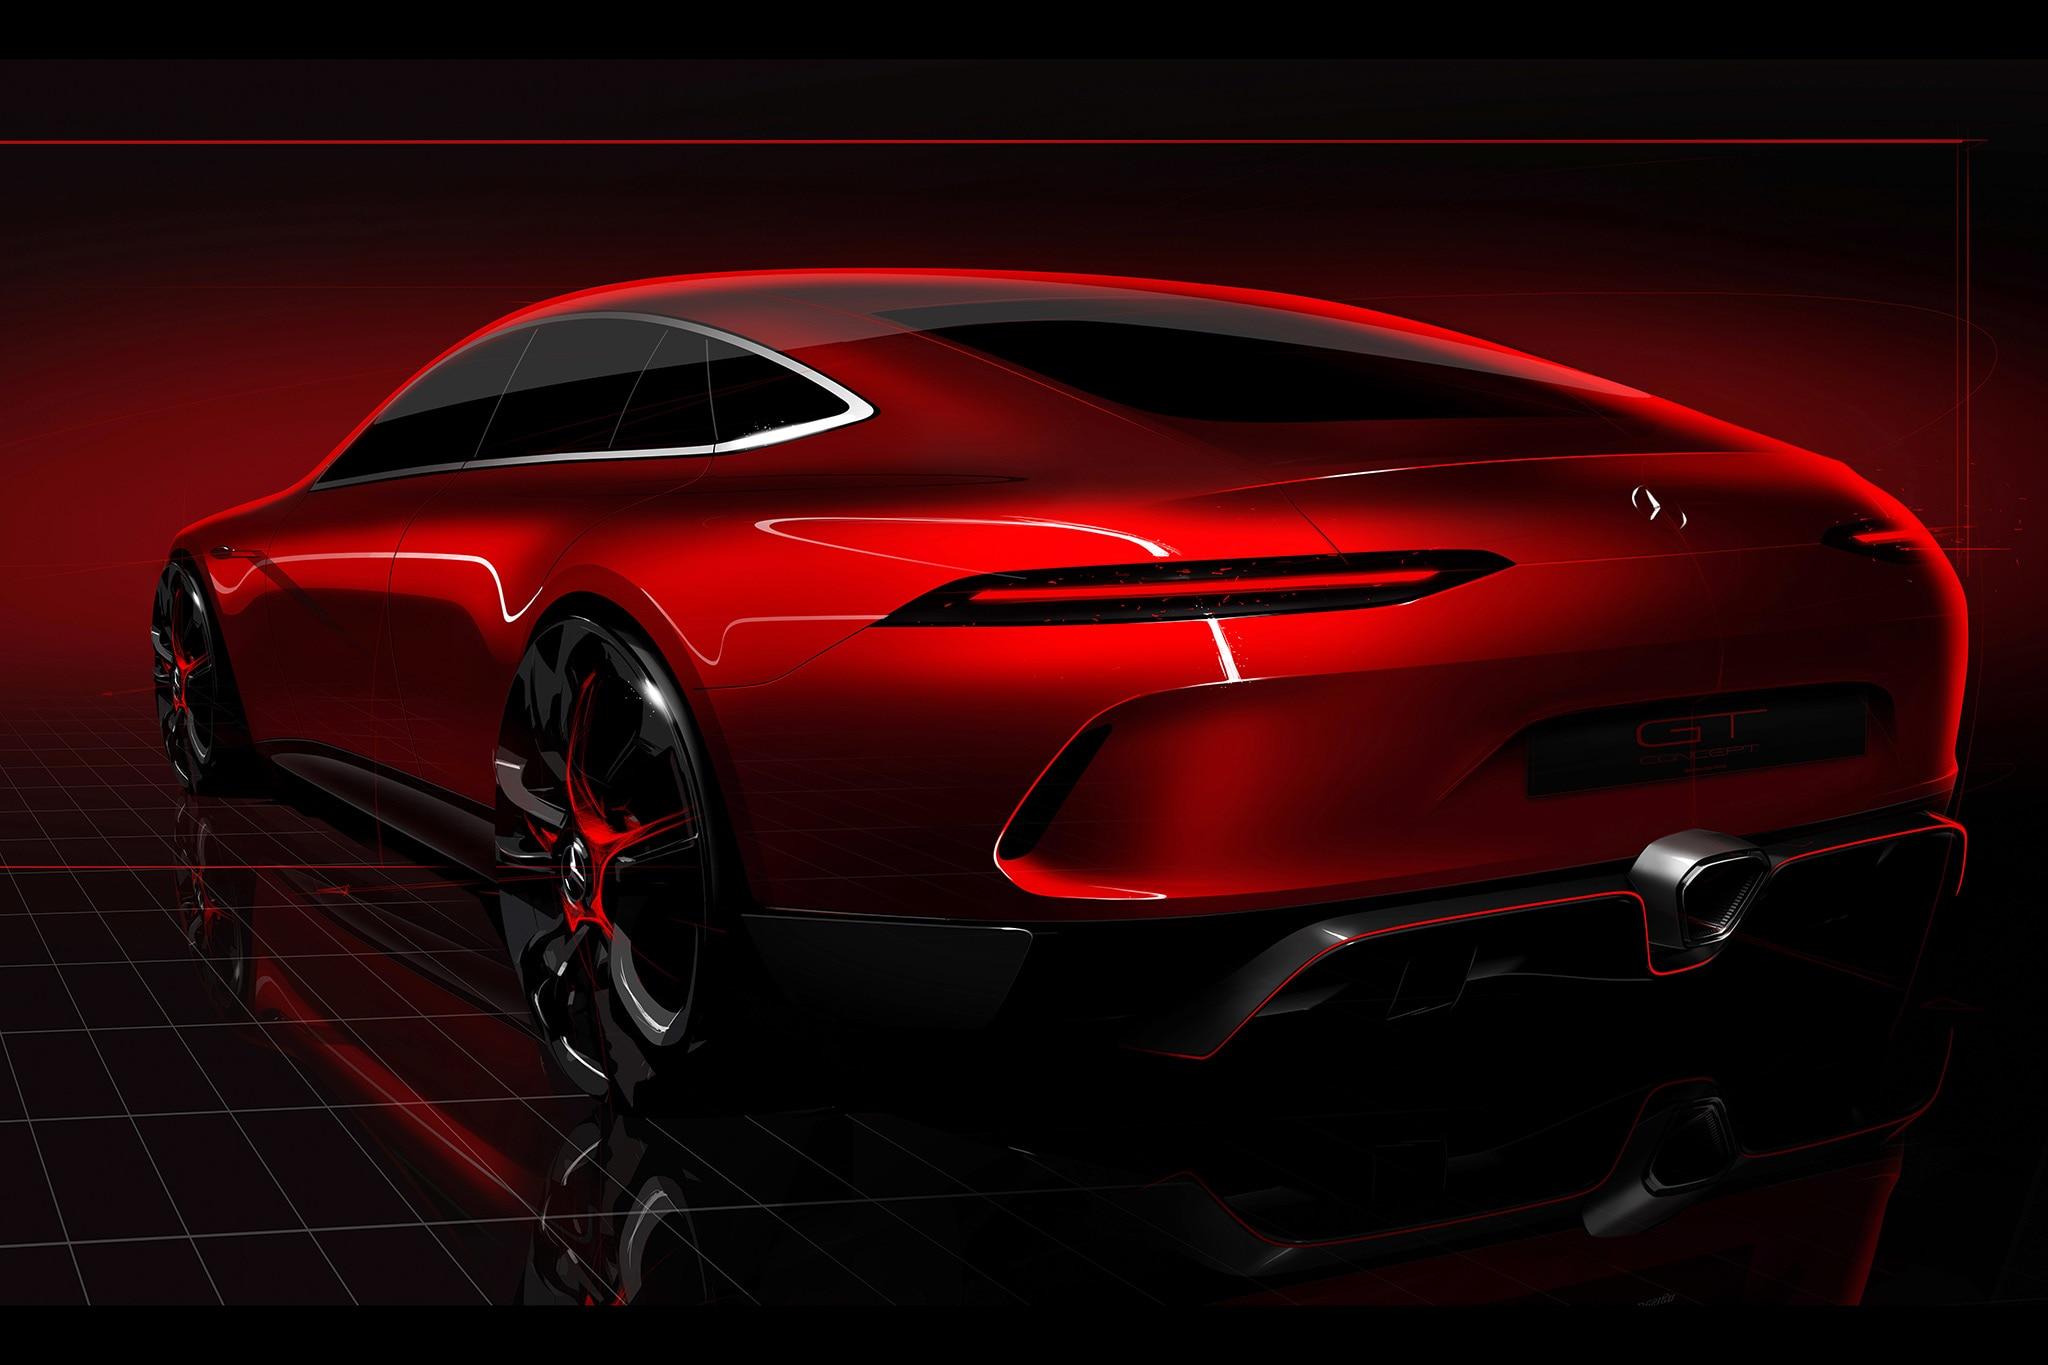 Mercedes Benz AMG GT Concept 2017 Geneva Teaser